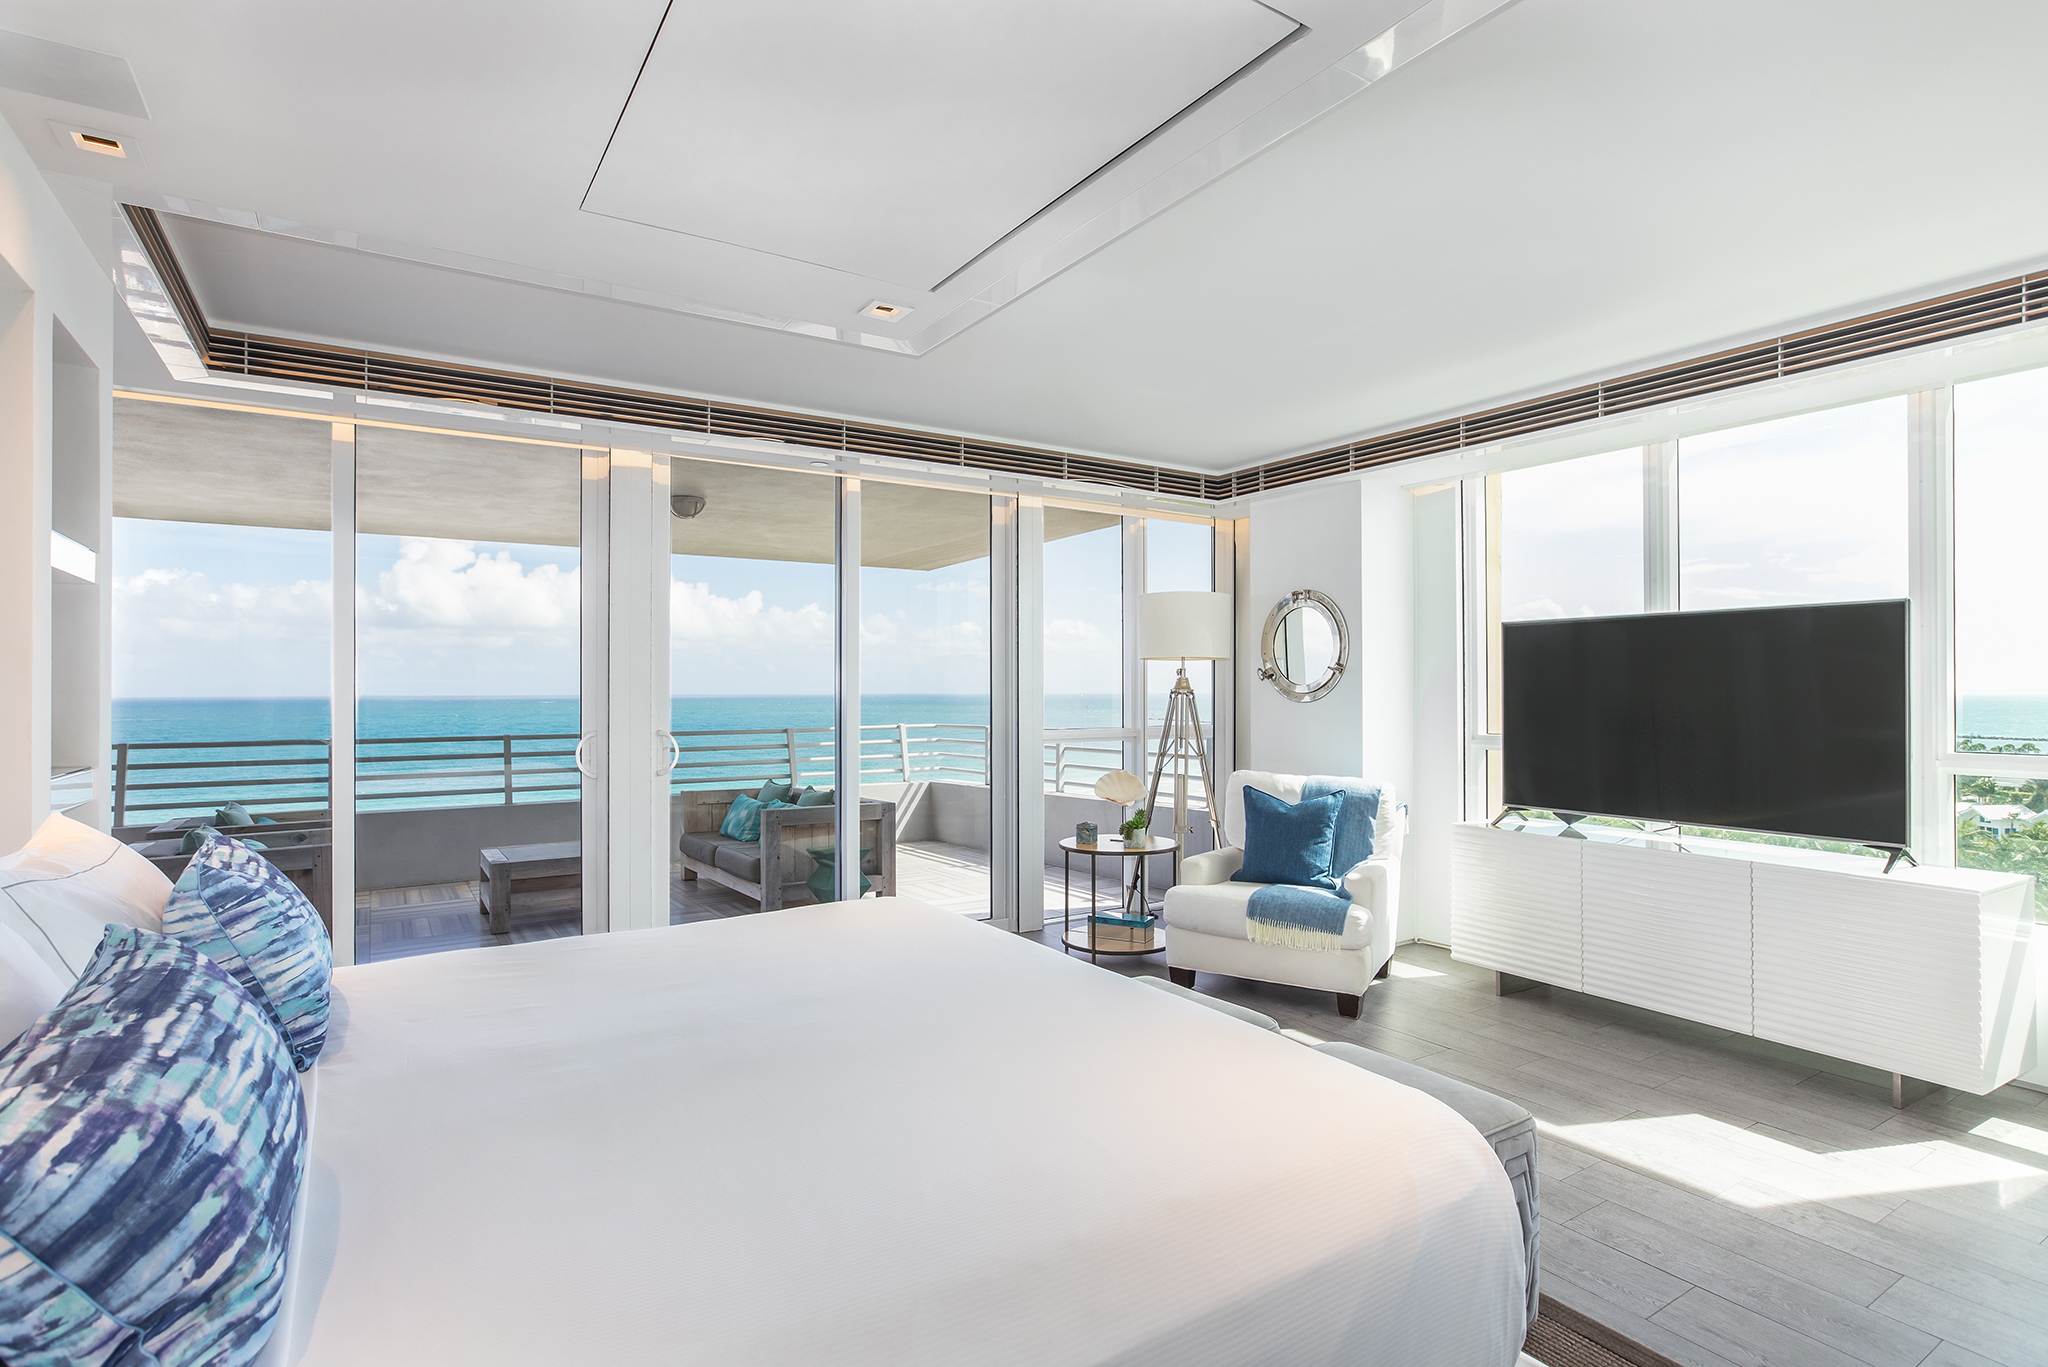 Hilton Bentley Miami South Beach Hotel Room 9